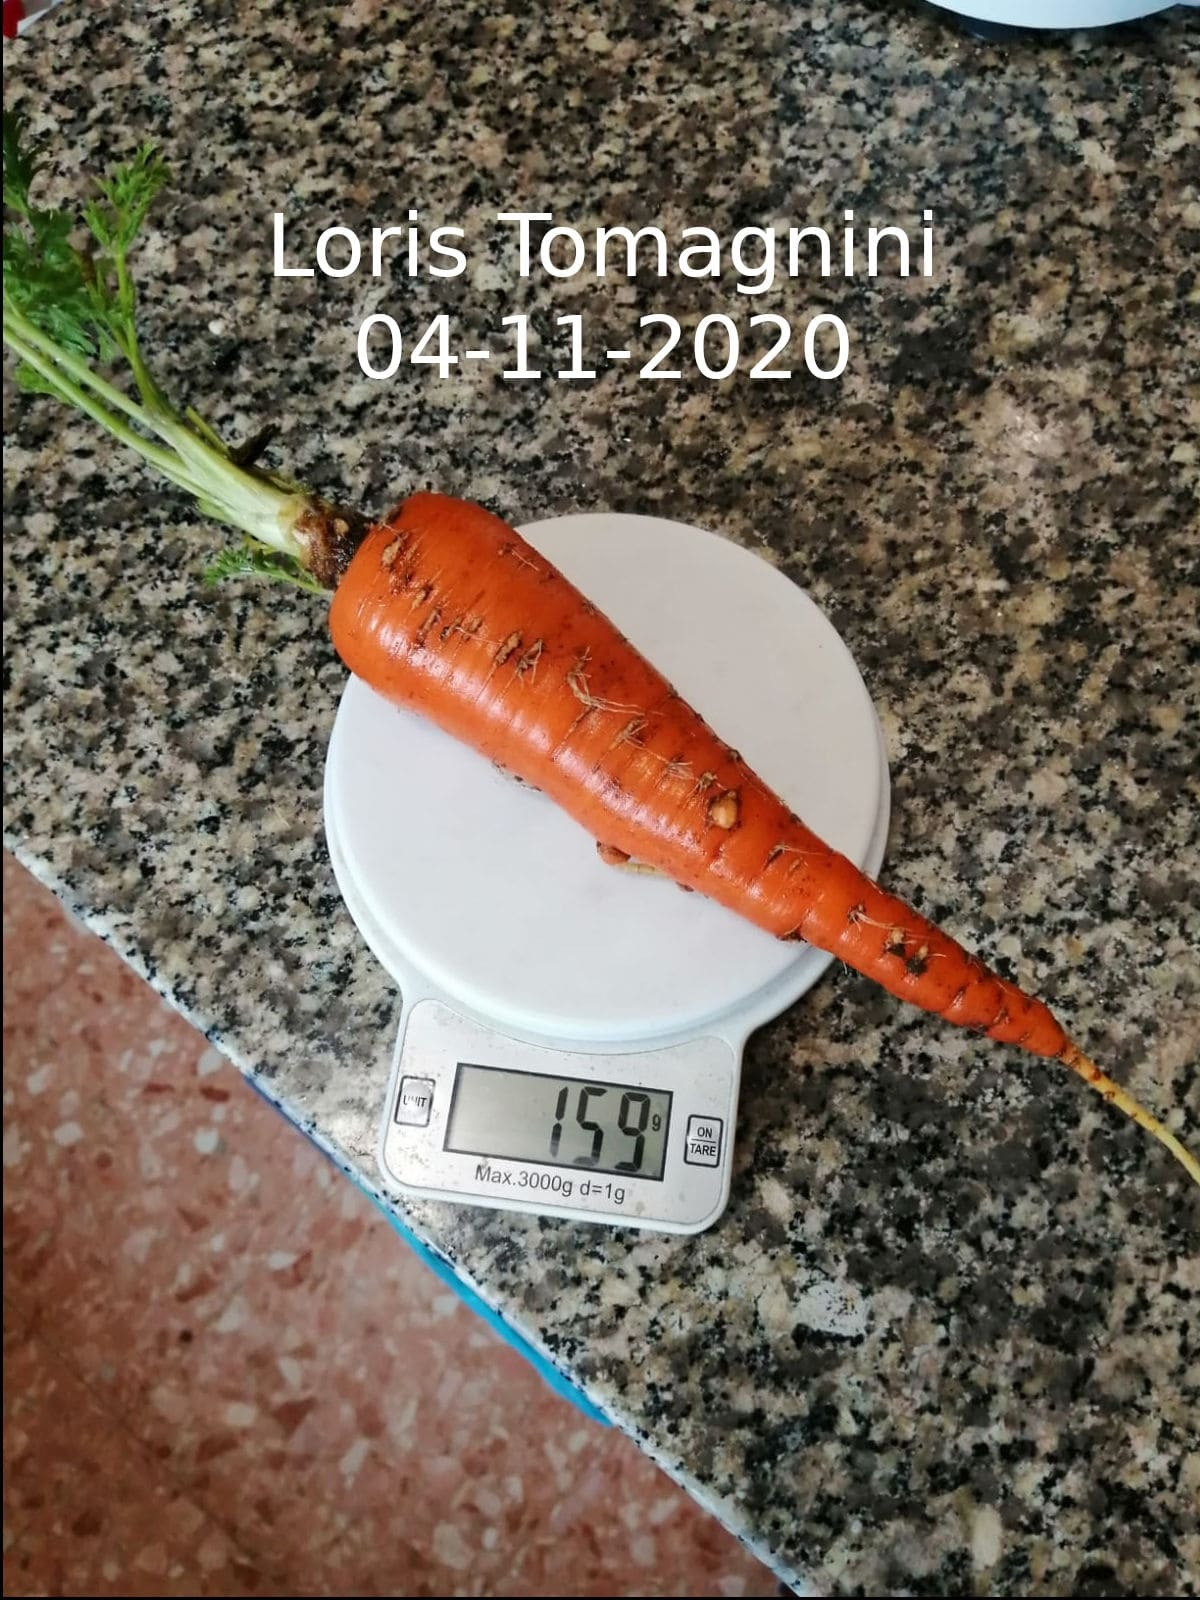 lacarotadiloristomagnini04112020-min-1604512873.jpg